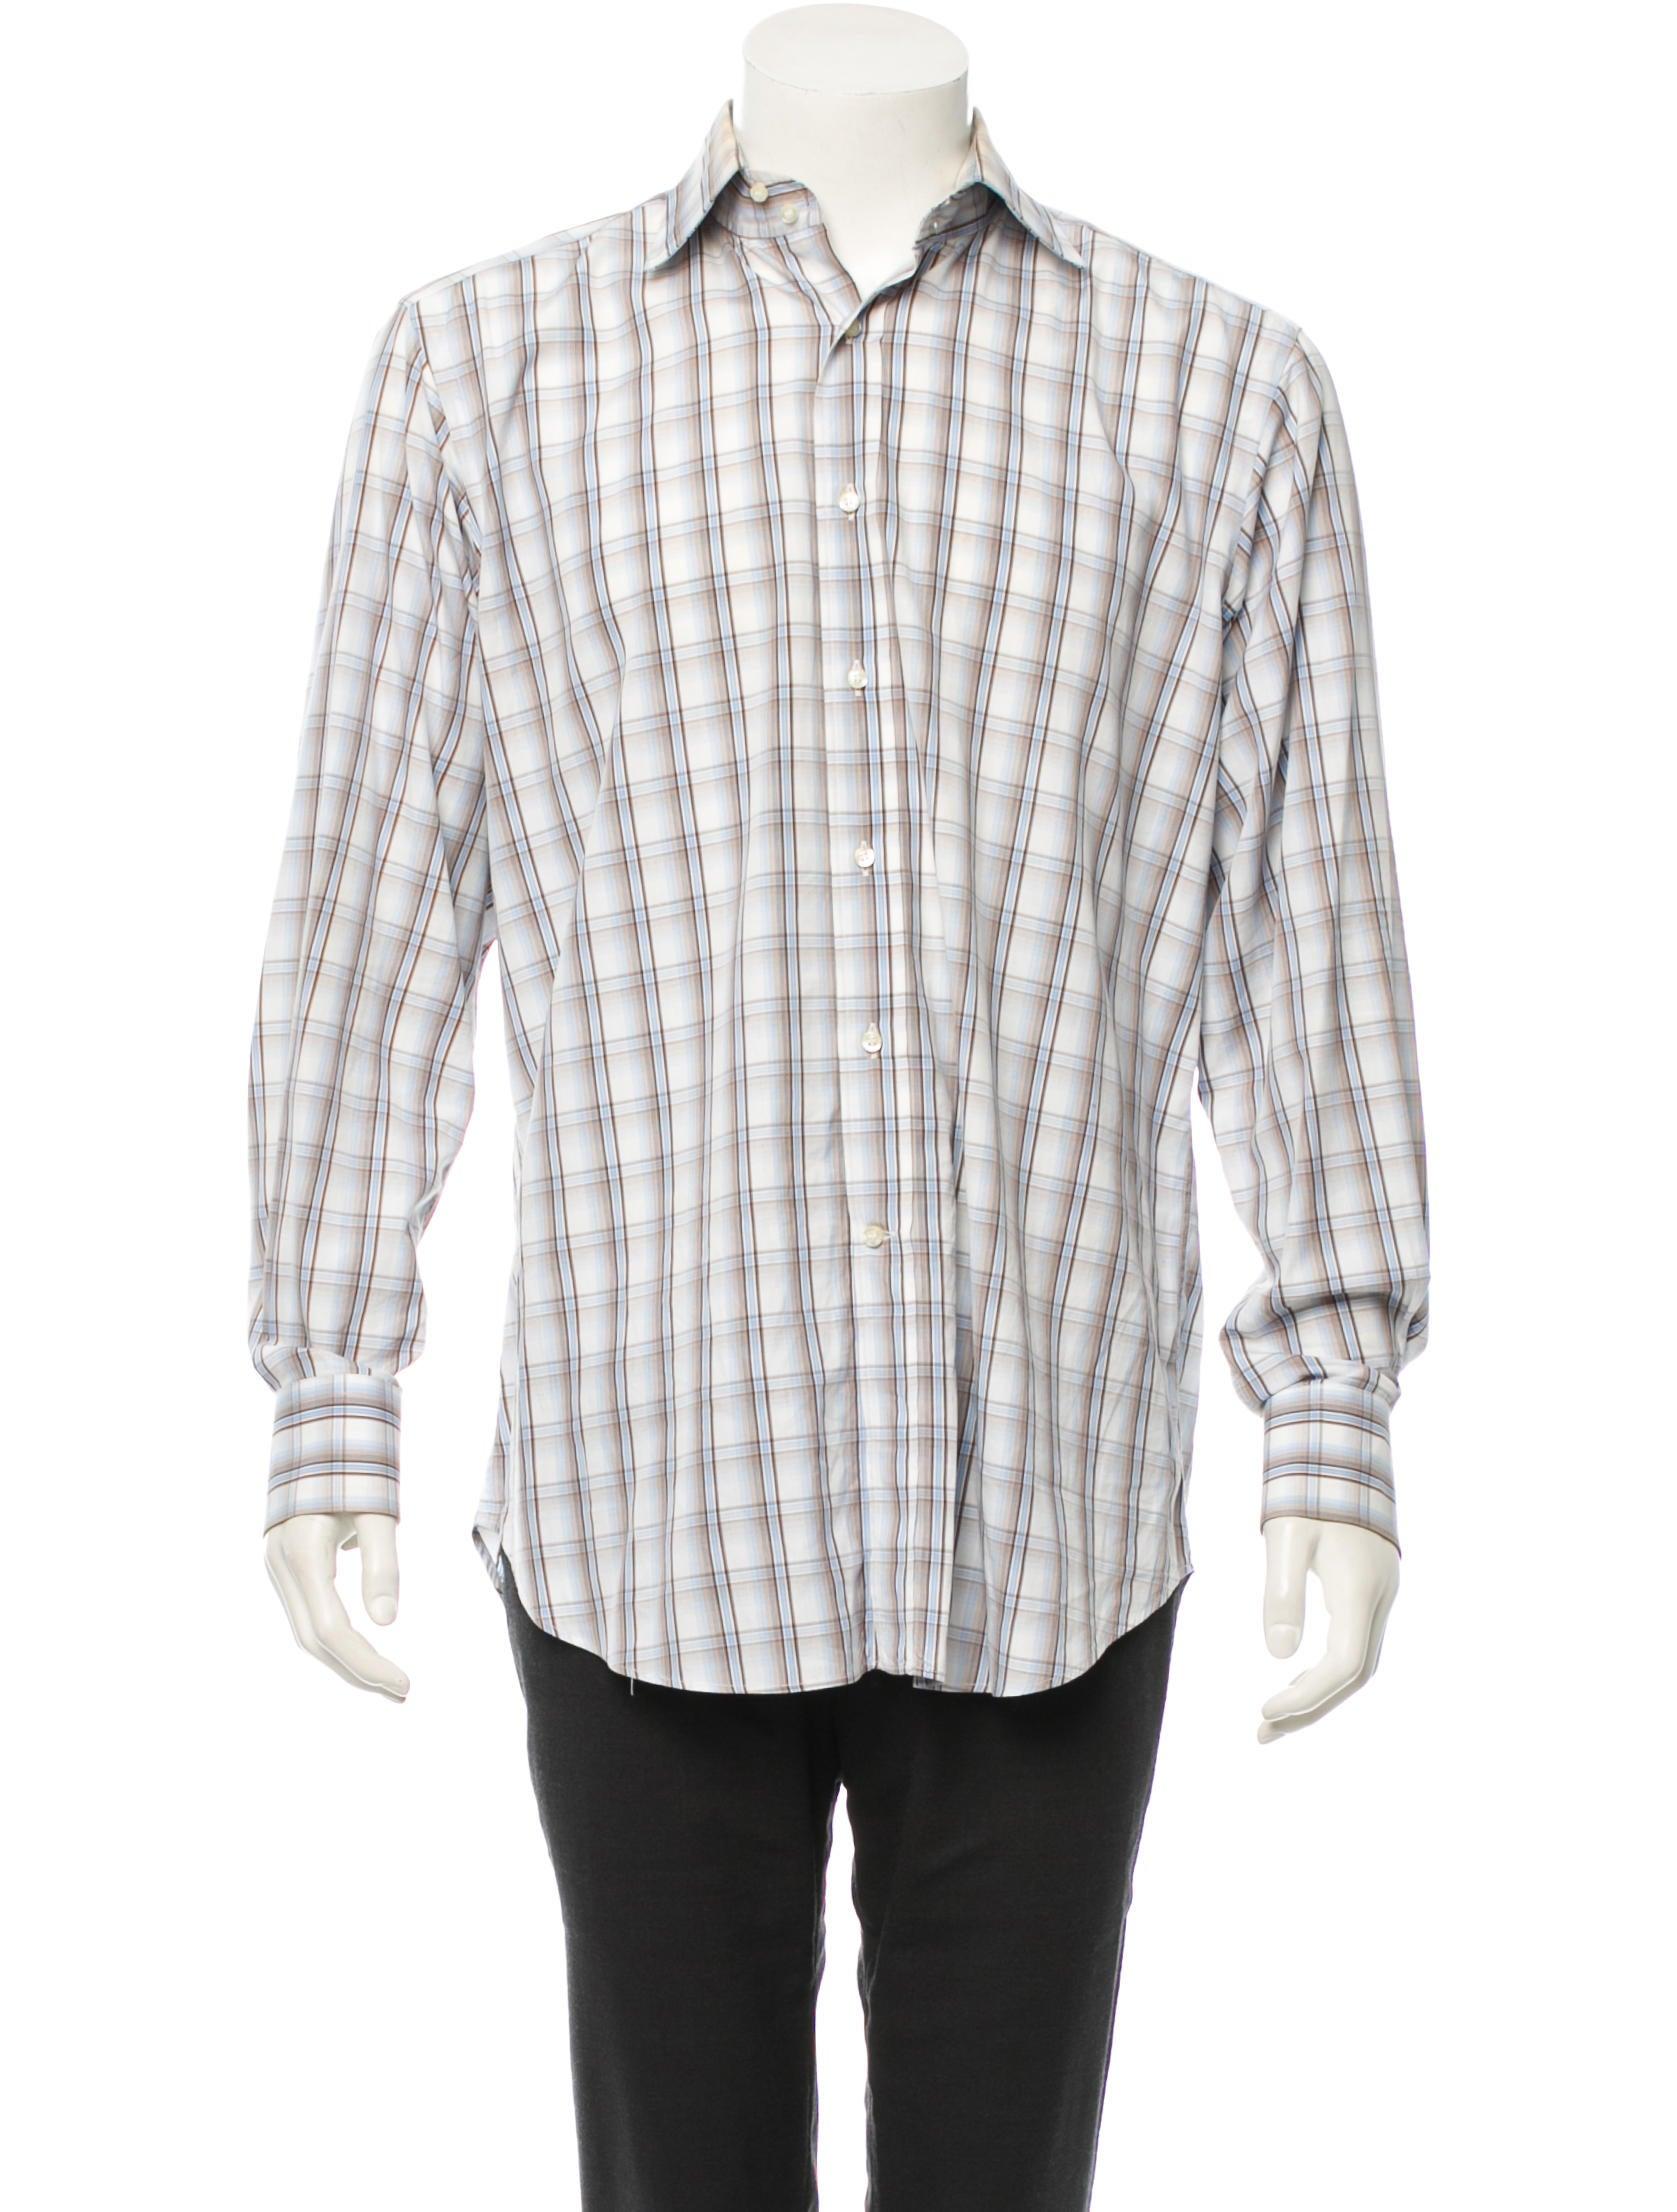 Etro shirt mens shirts etr27778 the realreal for Etro men s shirts